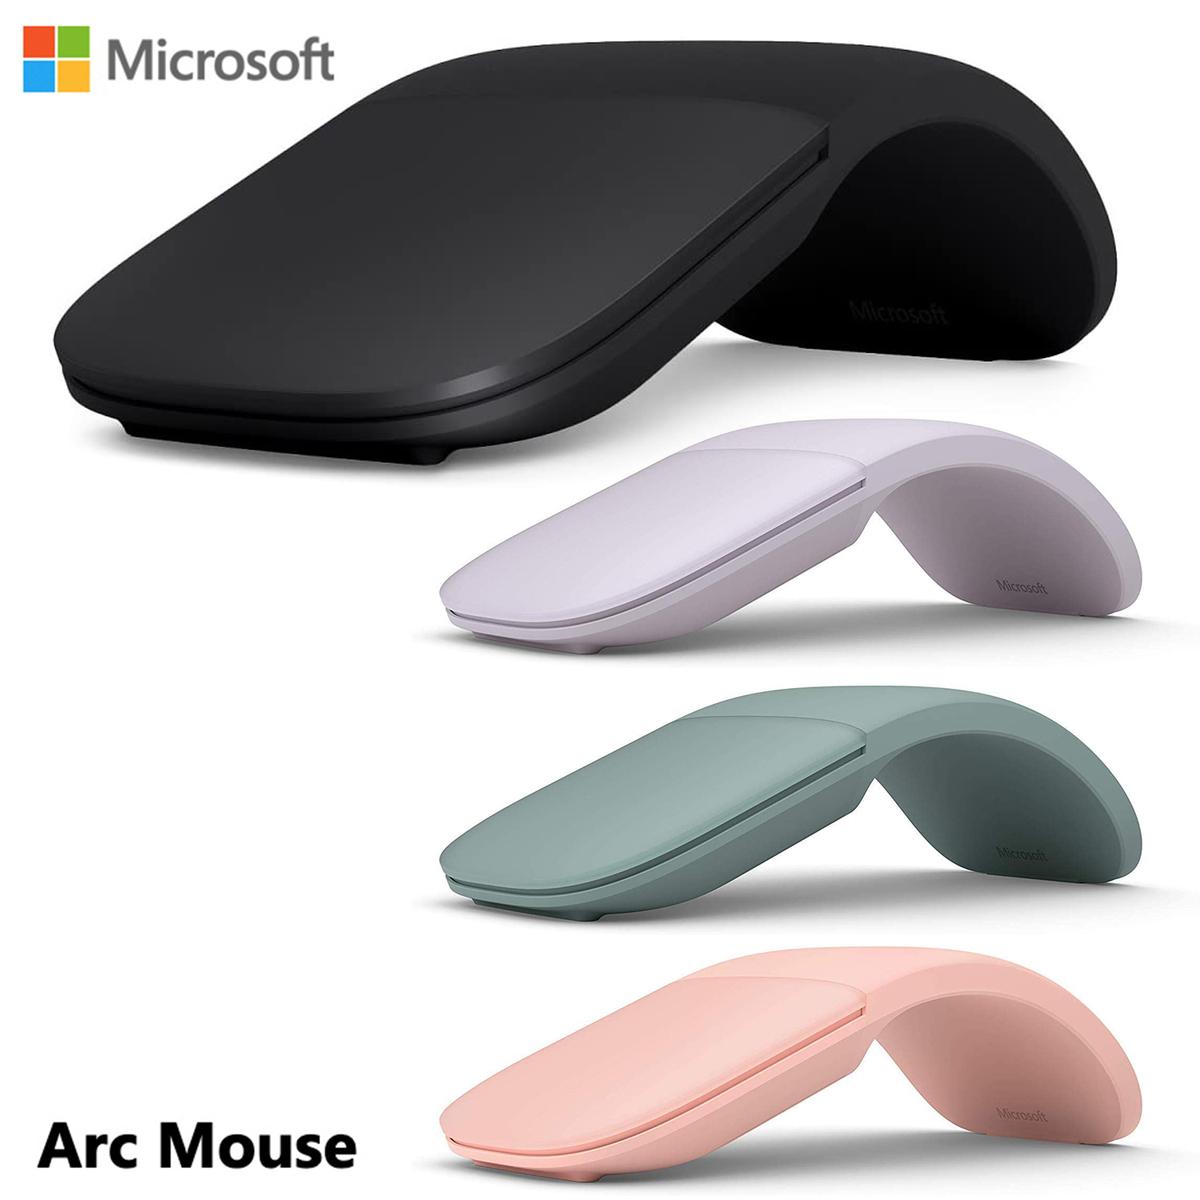 ELG-00007 ELG-00020 ELG-00046 Pink ELG-00033 Microsoft Arc Mouse アークマウス Bluetooth ☆最安値に挑戦 ピンク セージ マイクロソフト 驚きの値段 ライラック 小型 ブラック スナップ式 薄型 06